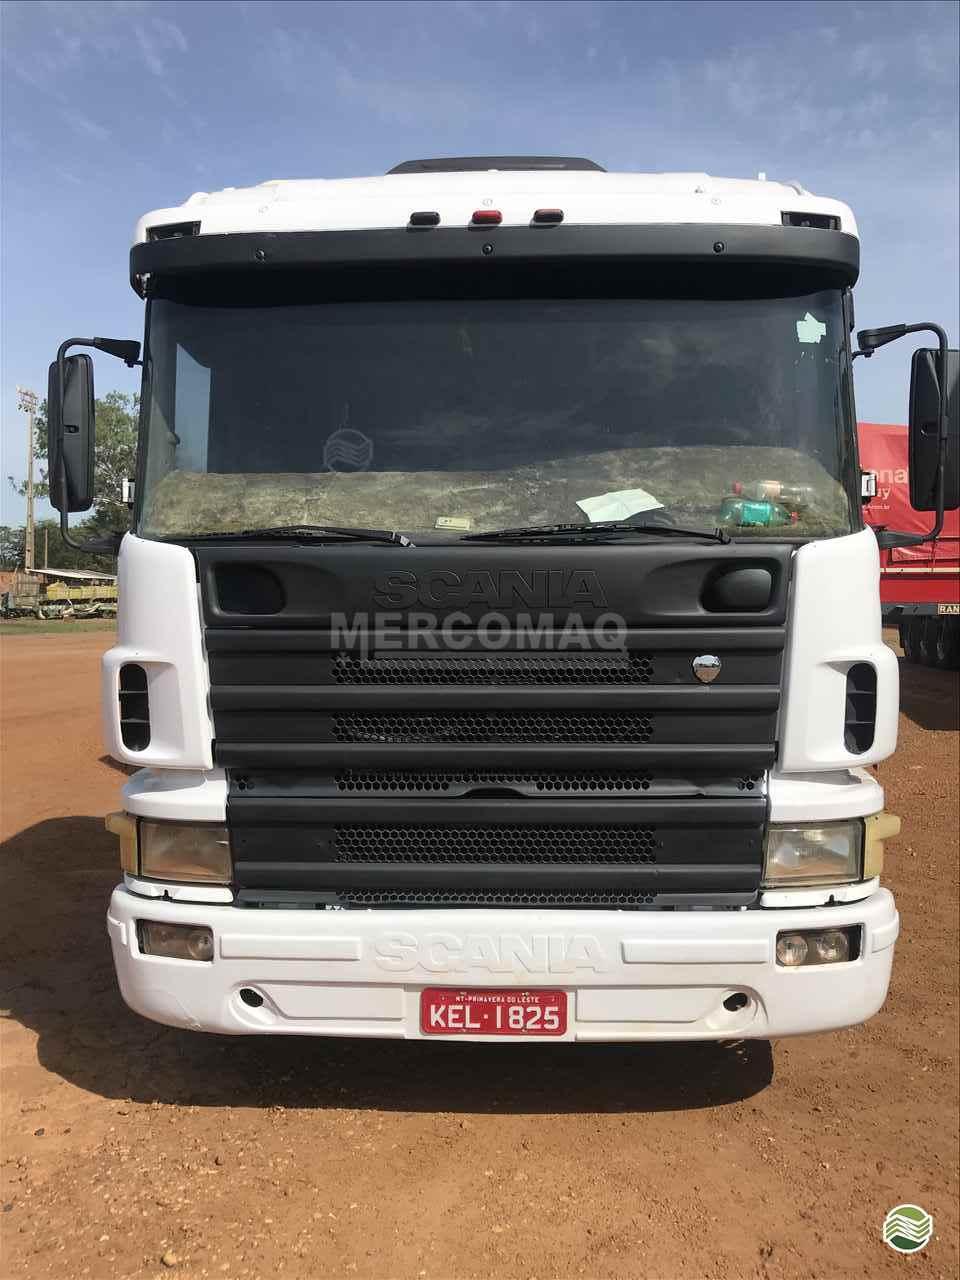 CAMINHAO SCANIA SCANIA 114 340 Graneleiro Truck 6x2 Mercomaq - JAN - GTS PRIMAVERA DO LESTE MATO GROSSO MT